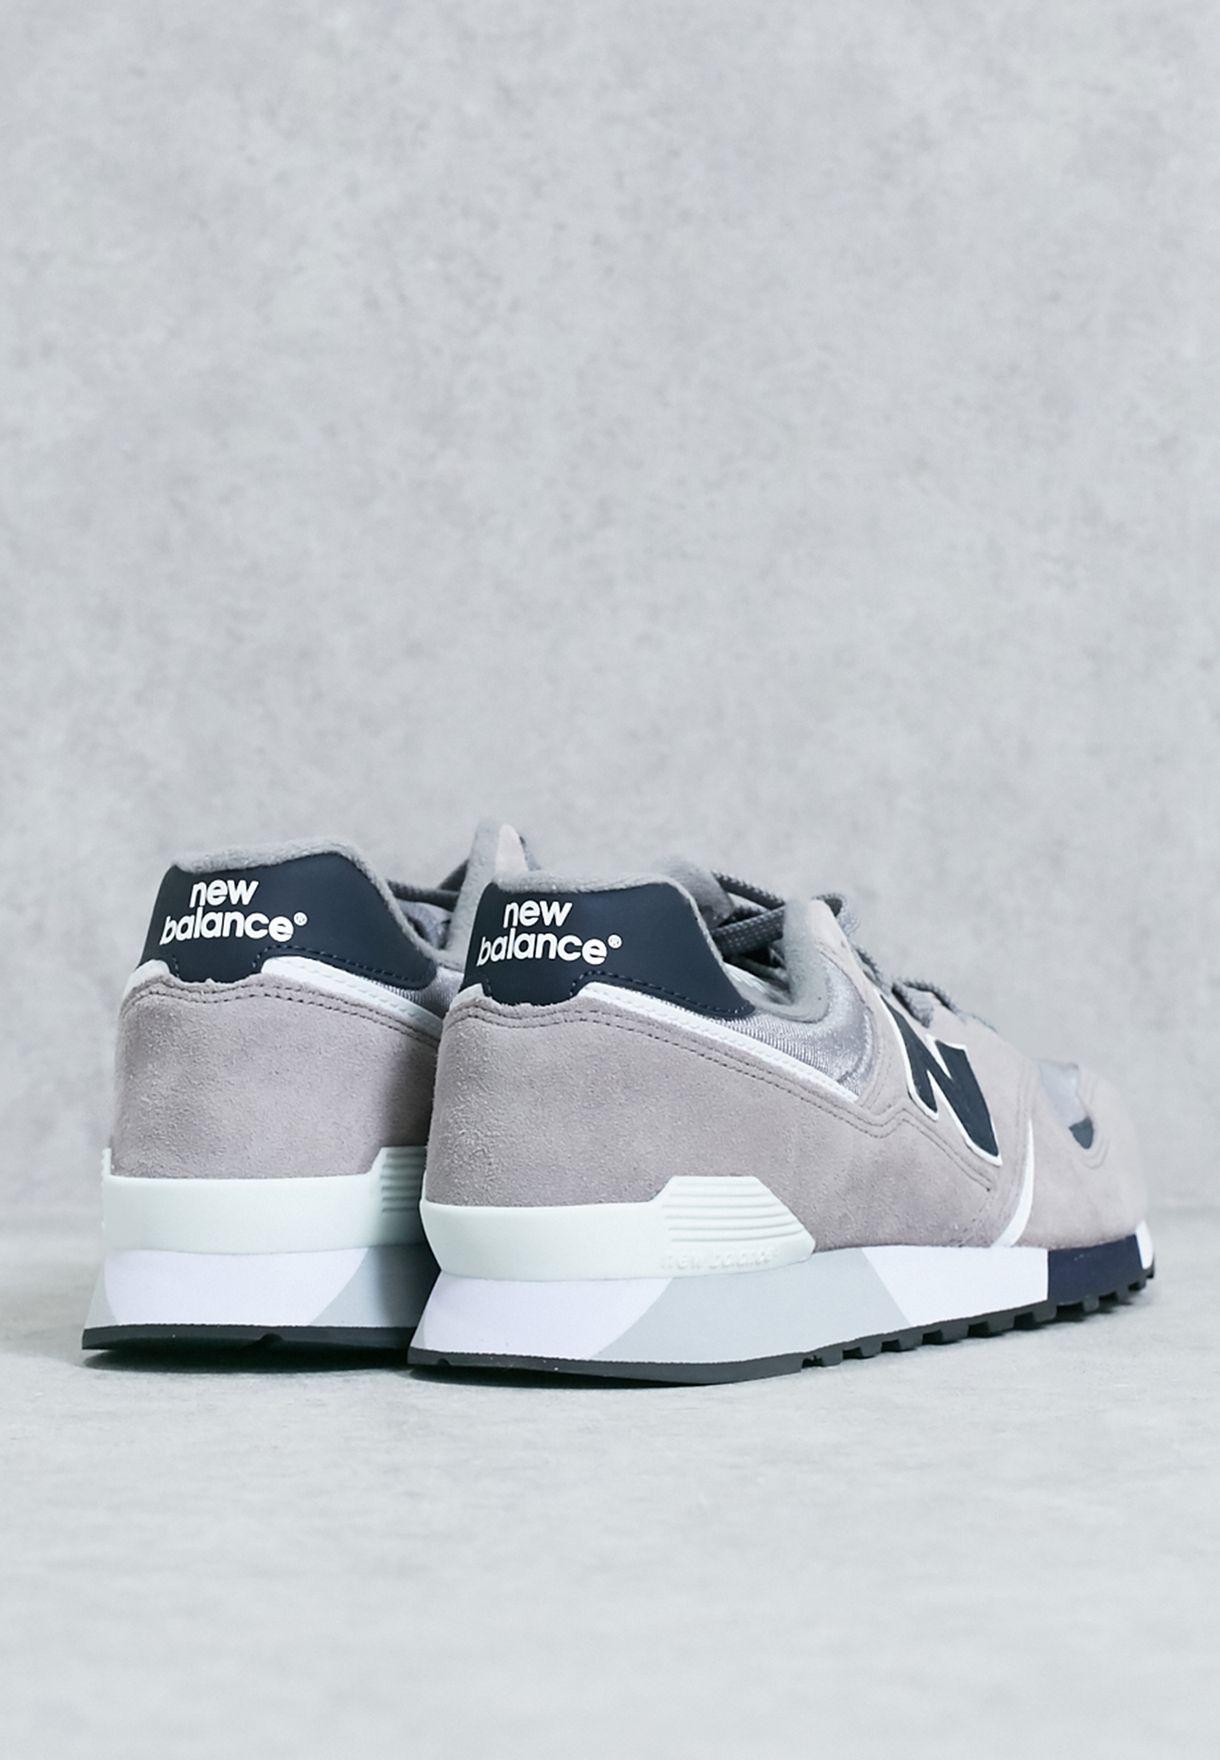 separation shoes 8c565 fd196 U446 Sneakers